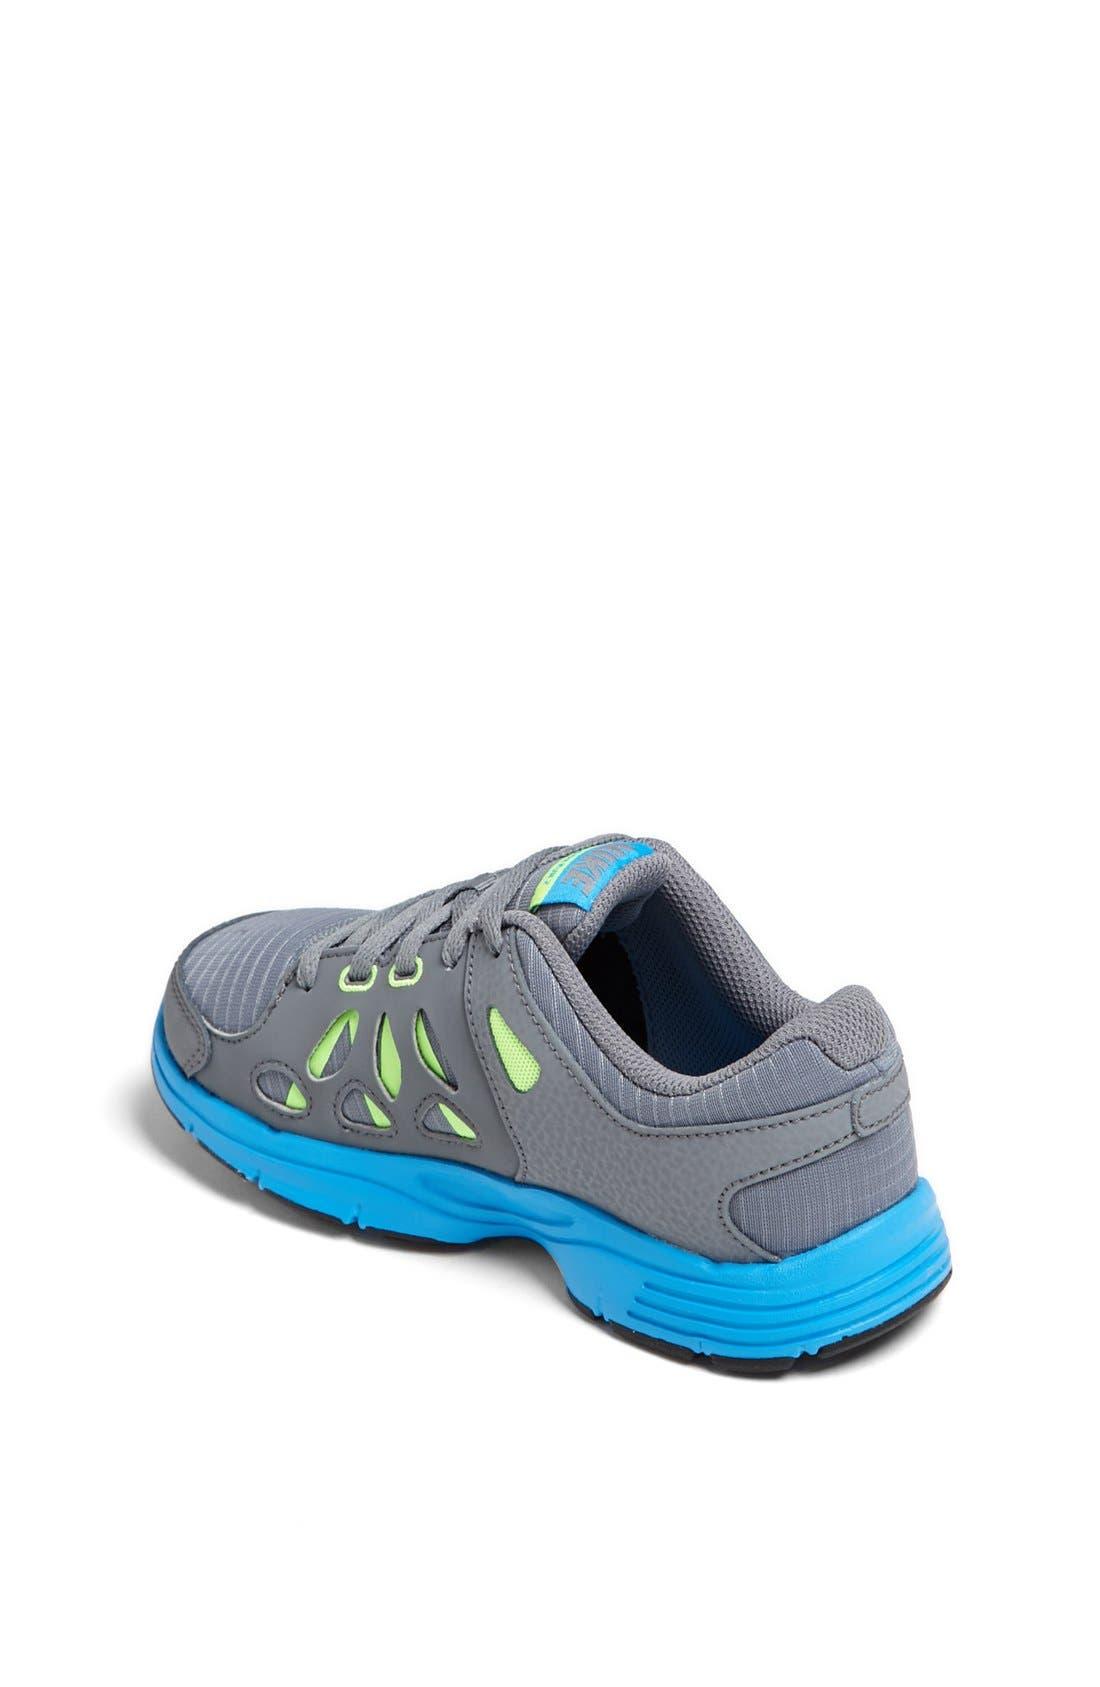 Alternate Image 2  - Nike 'Dual Fusion' Sneaker (Little Kid)